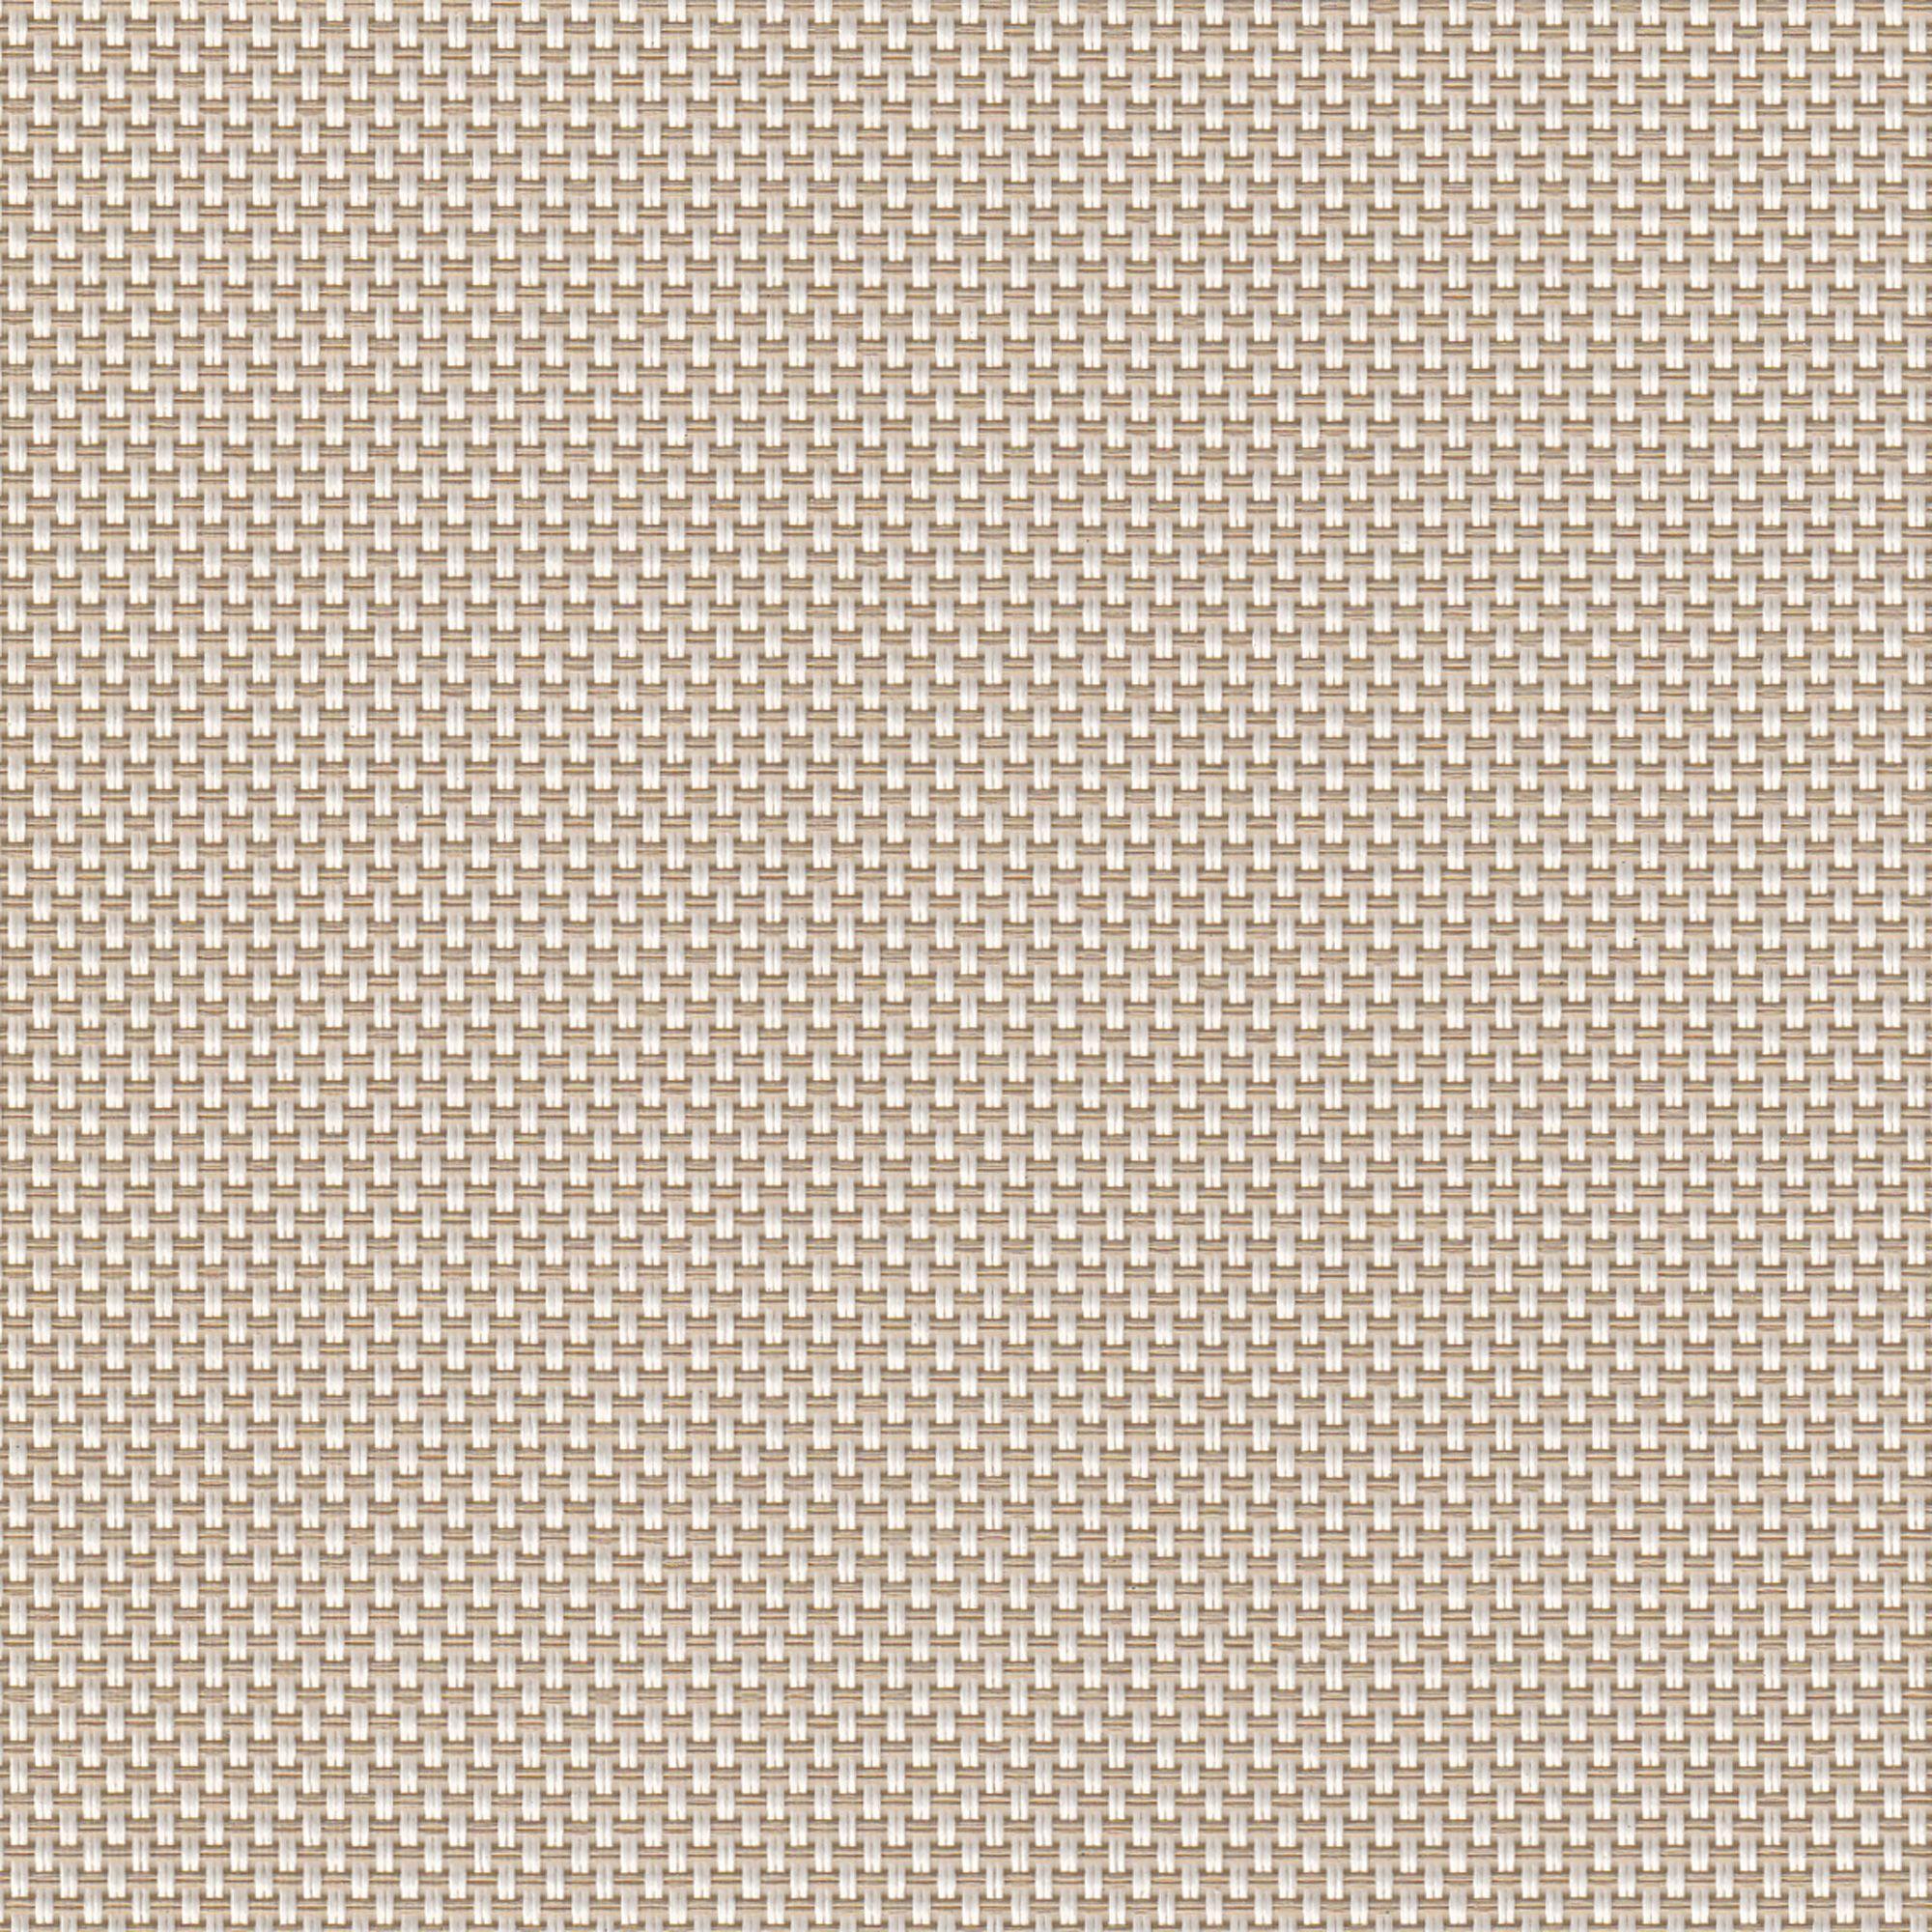 Nordic Screen BW White-Sand